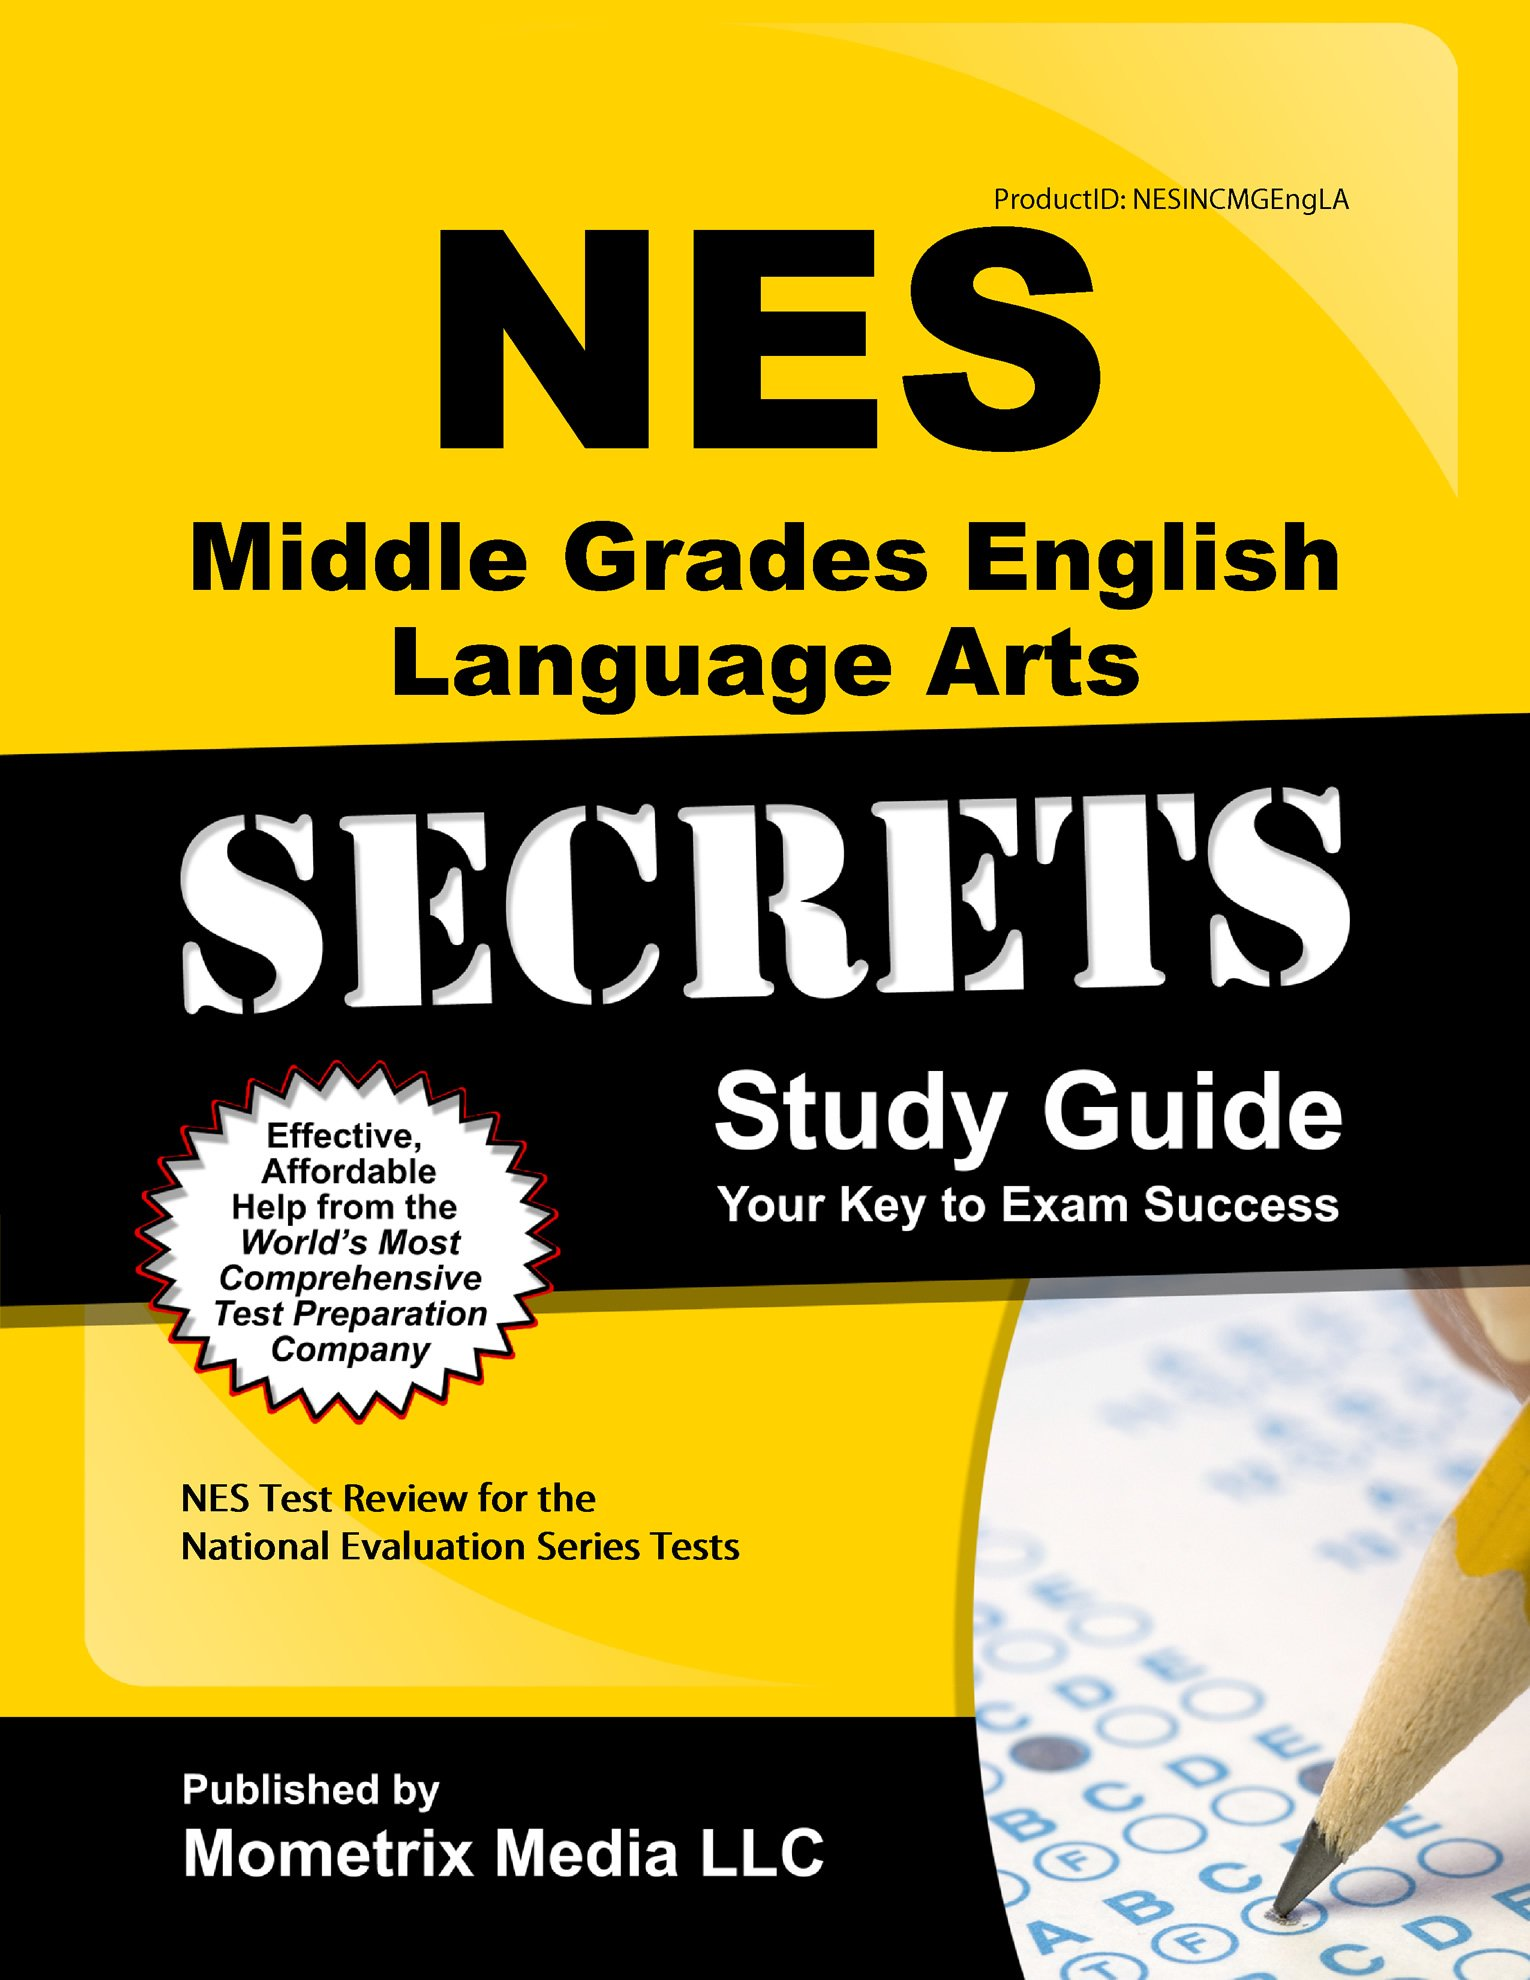 NES Middle Grades English Language Arts Secrets Study Guide: NES Test Review for the National Evaluation Series Tests (Secrets (Mometrix))